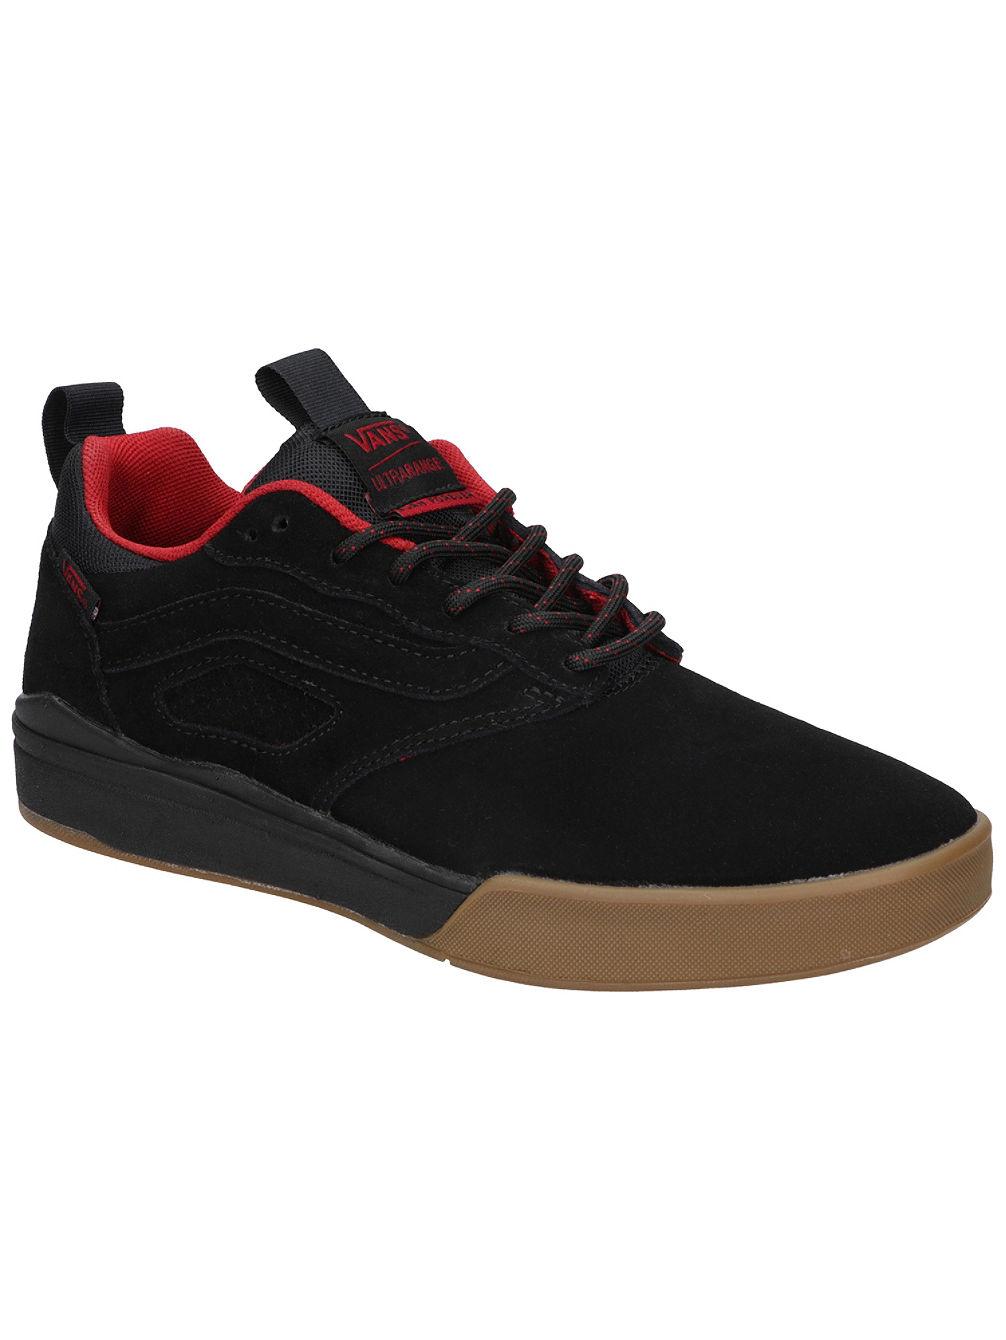 cb9b7606352db5 ... Men Shoes Skate Shoes. Sale. Spitfire Ultrarange Pro Skate Shoes. Vans